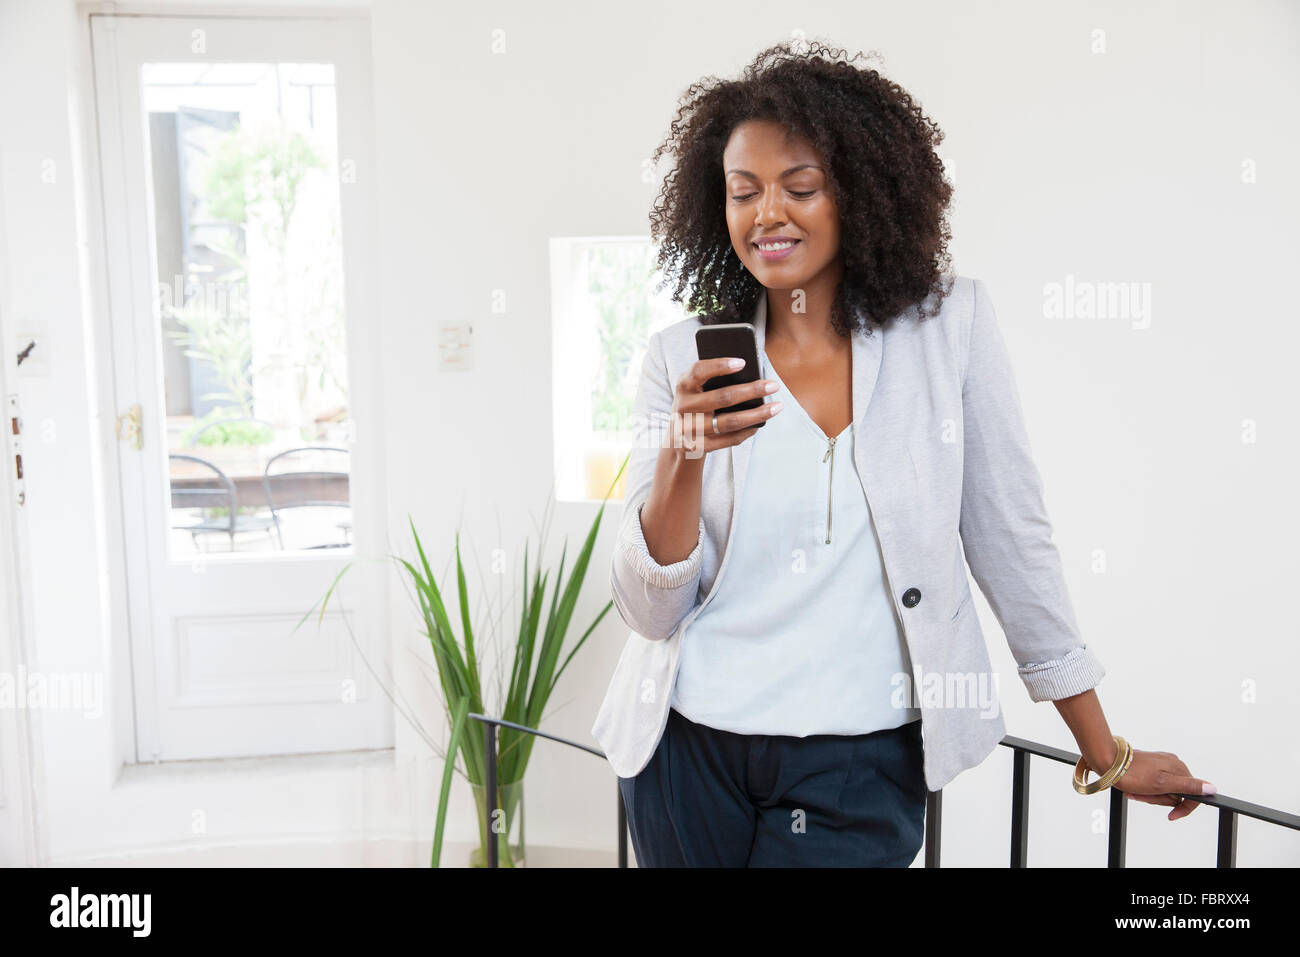 Woman using smartphone - Stock Image